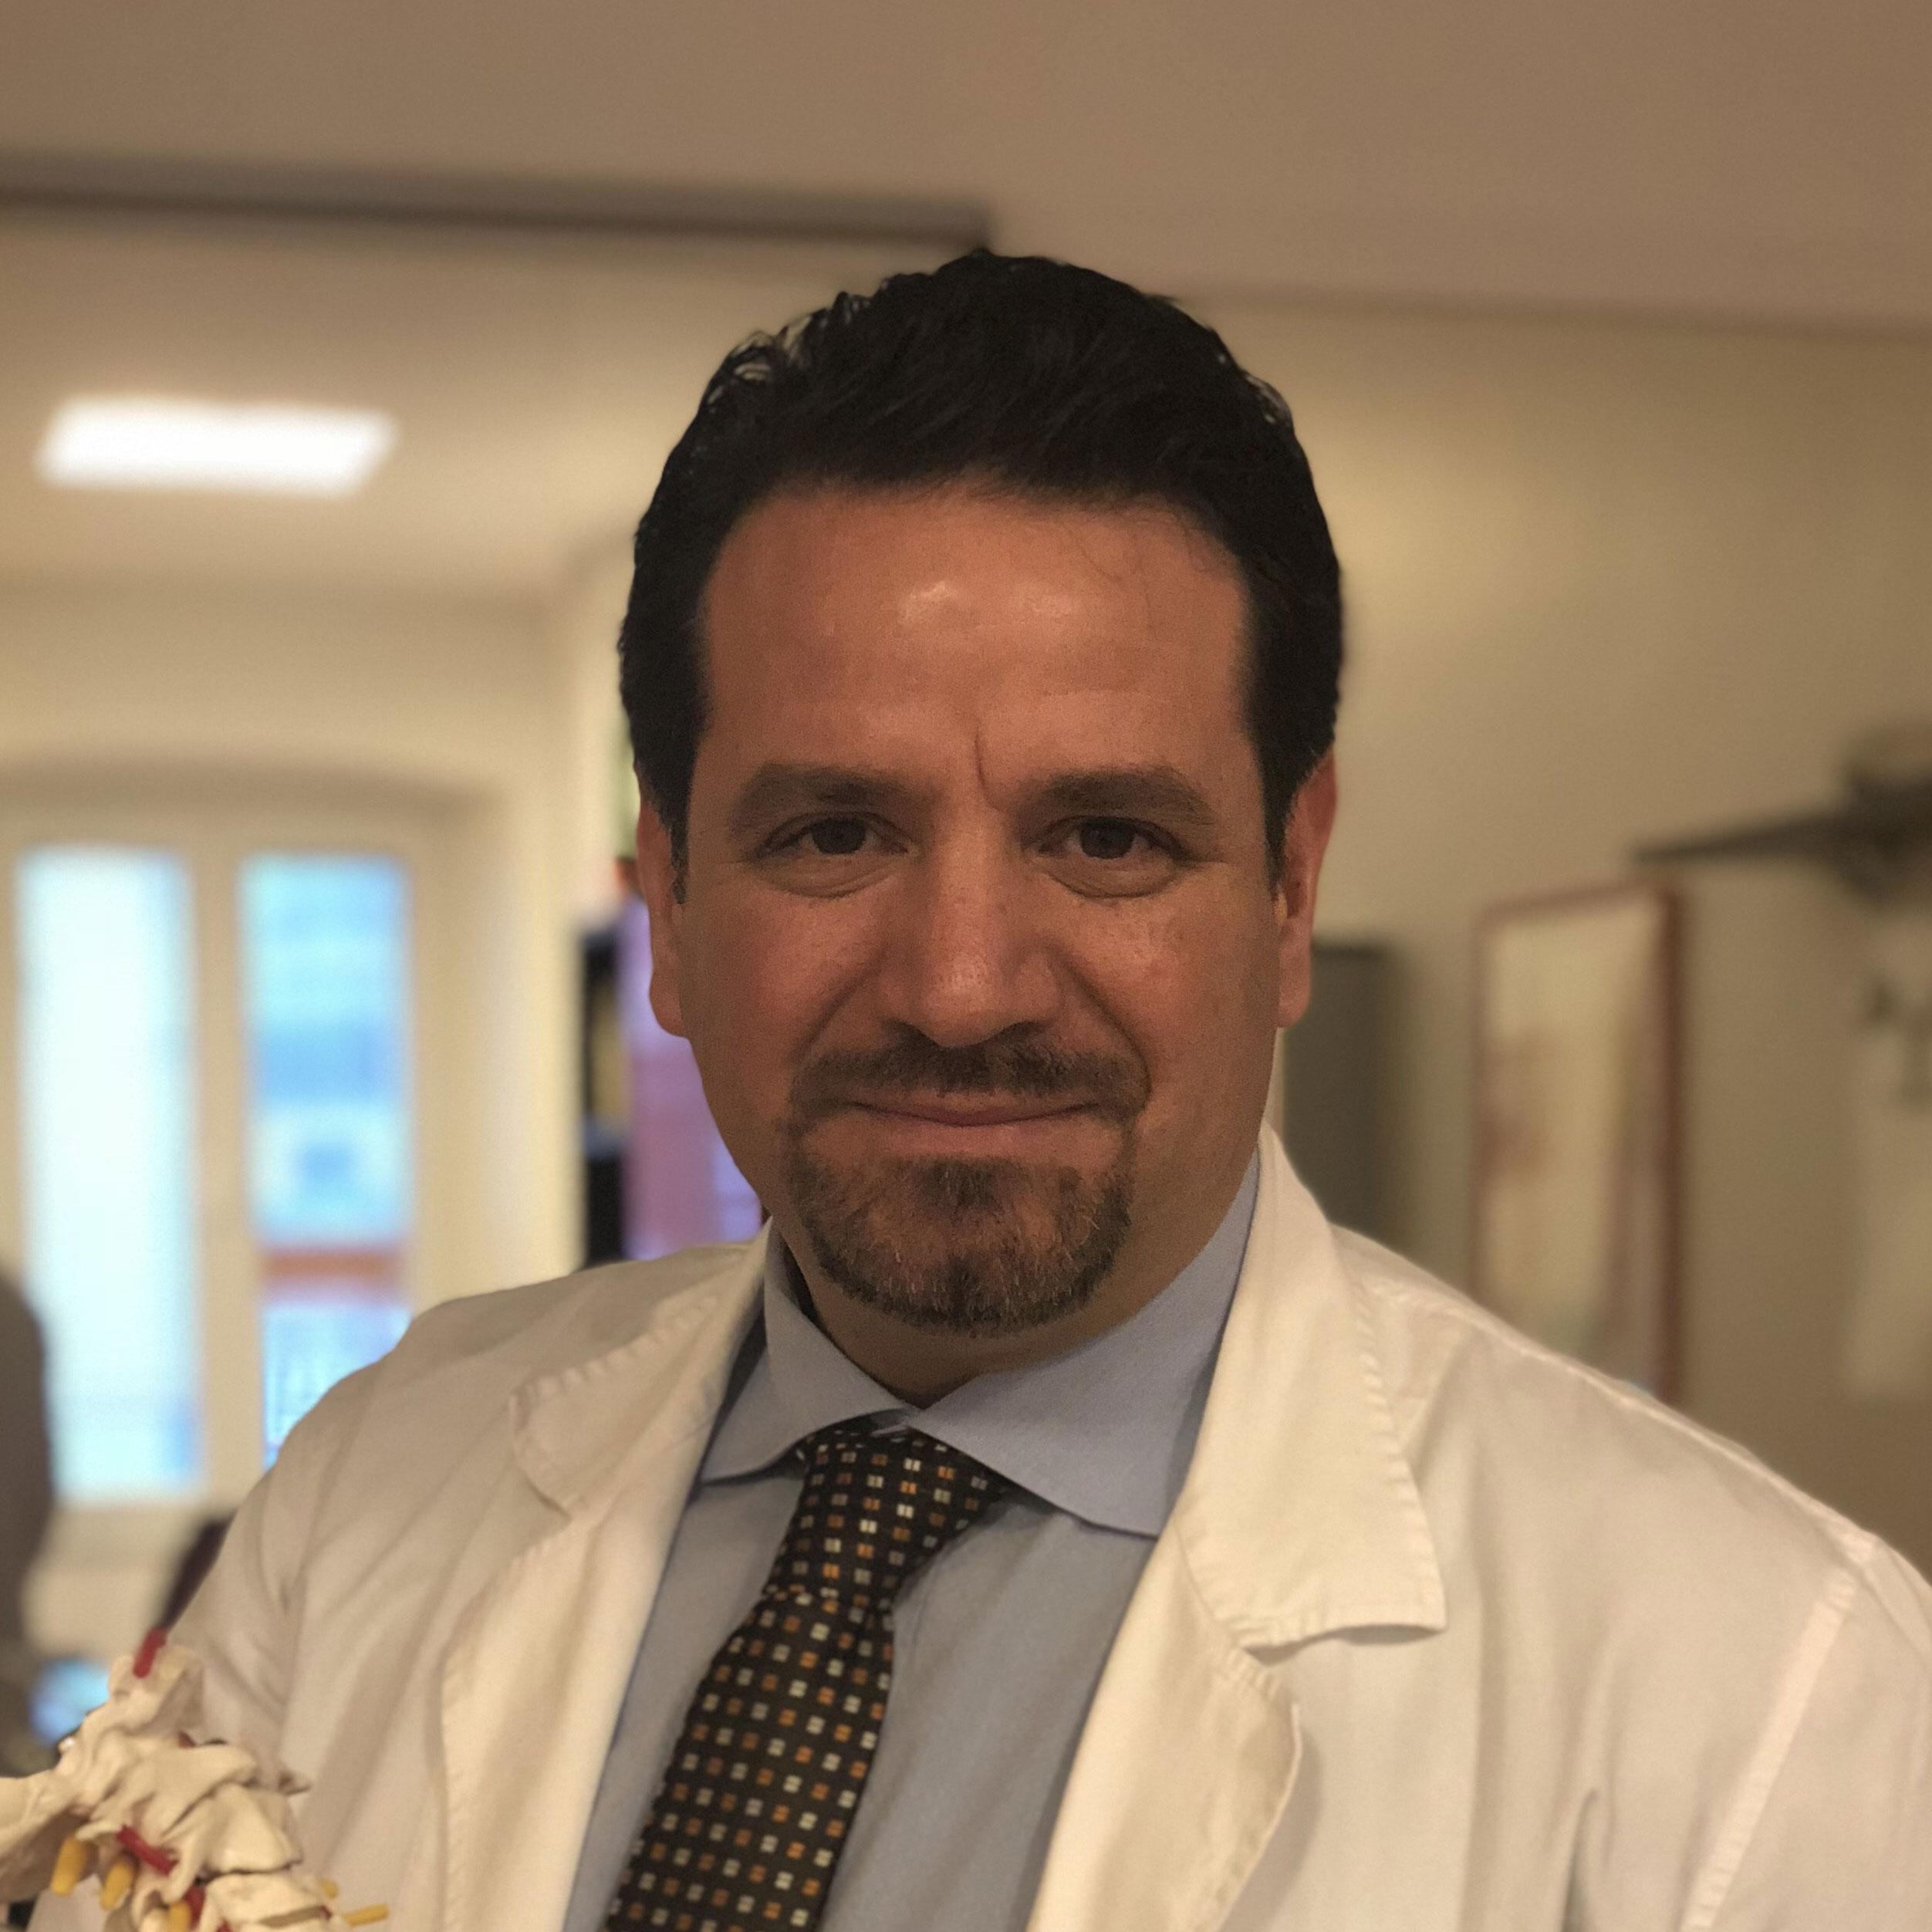 Dott. Antonio Scollato